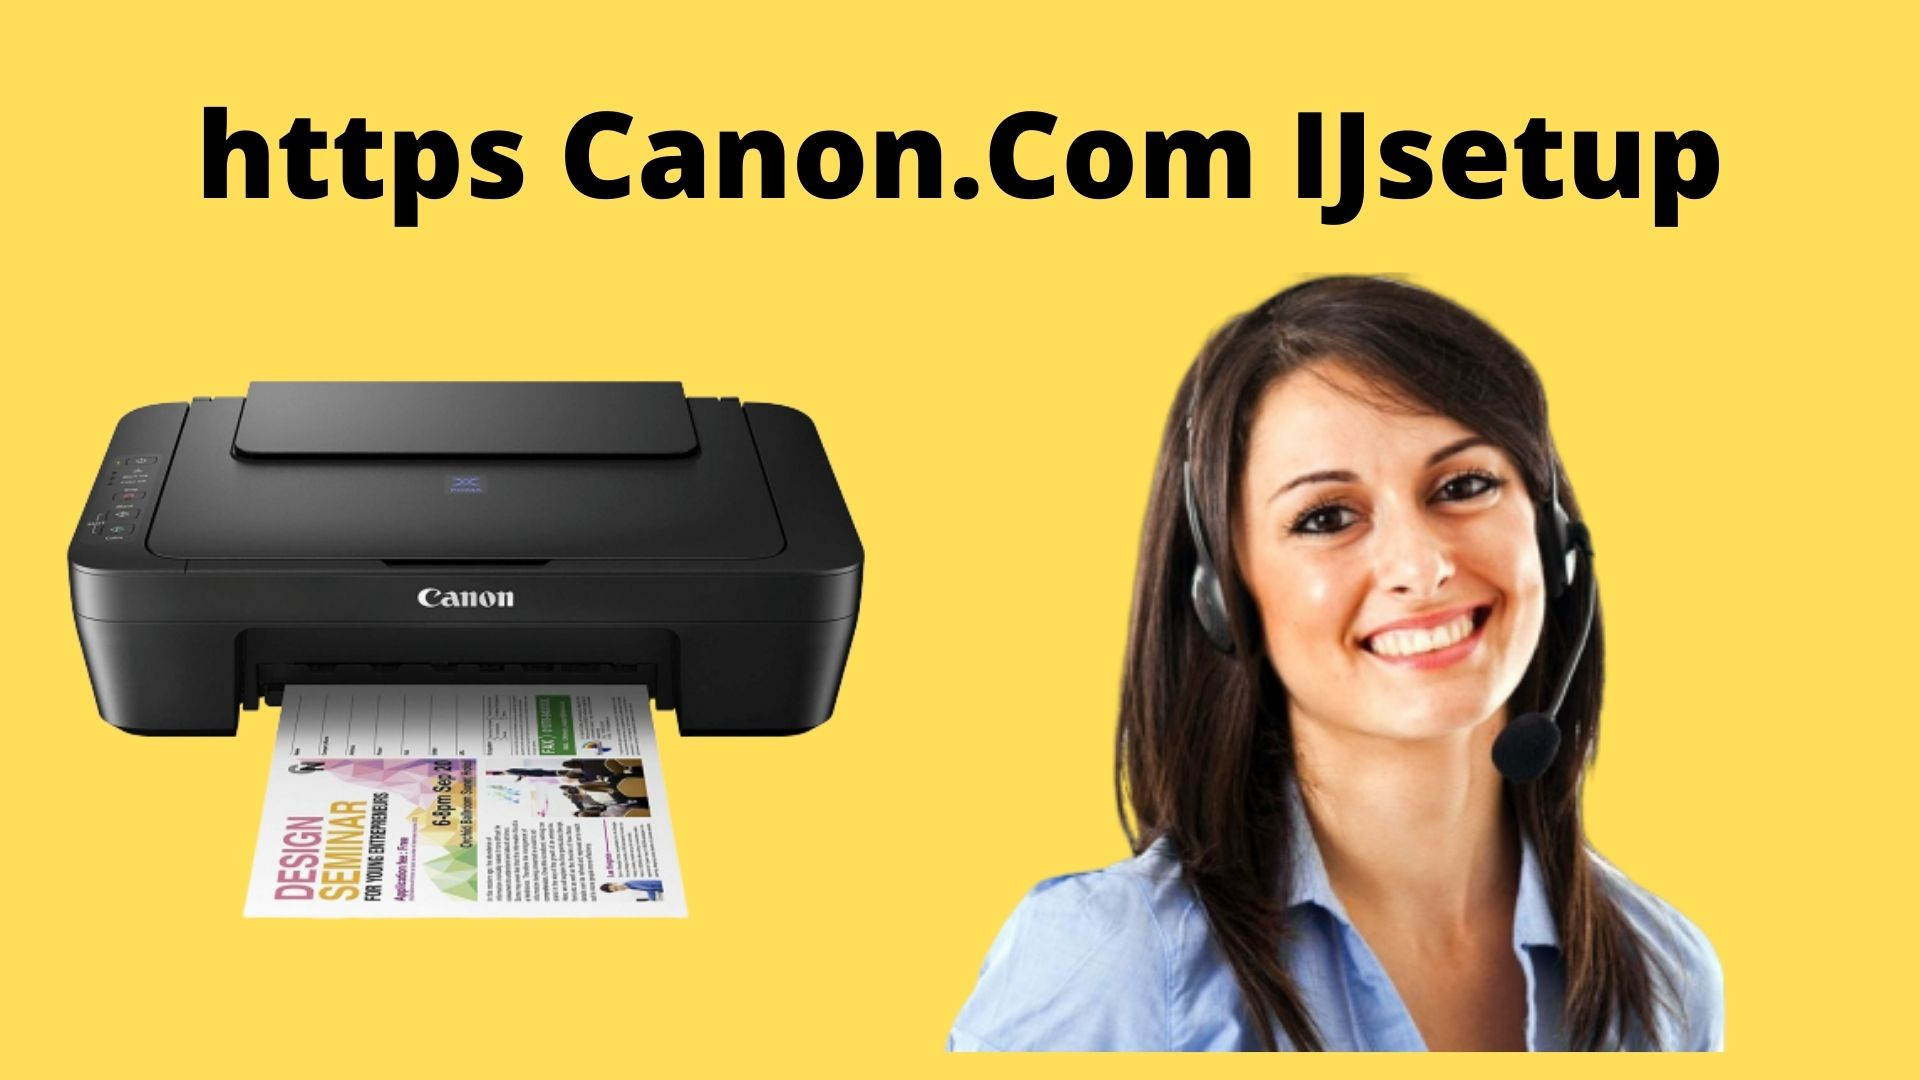 https-Canon.Com-IJsetup